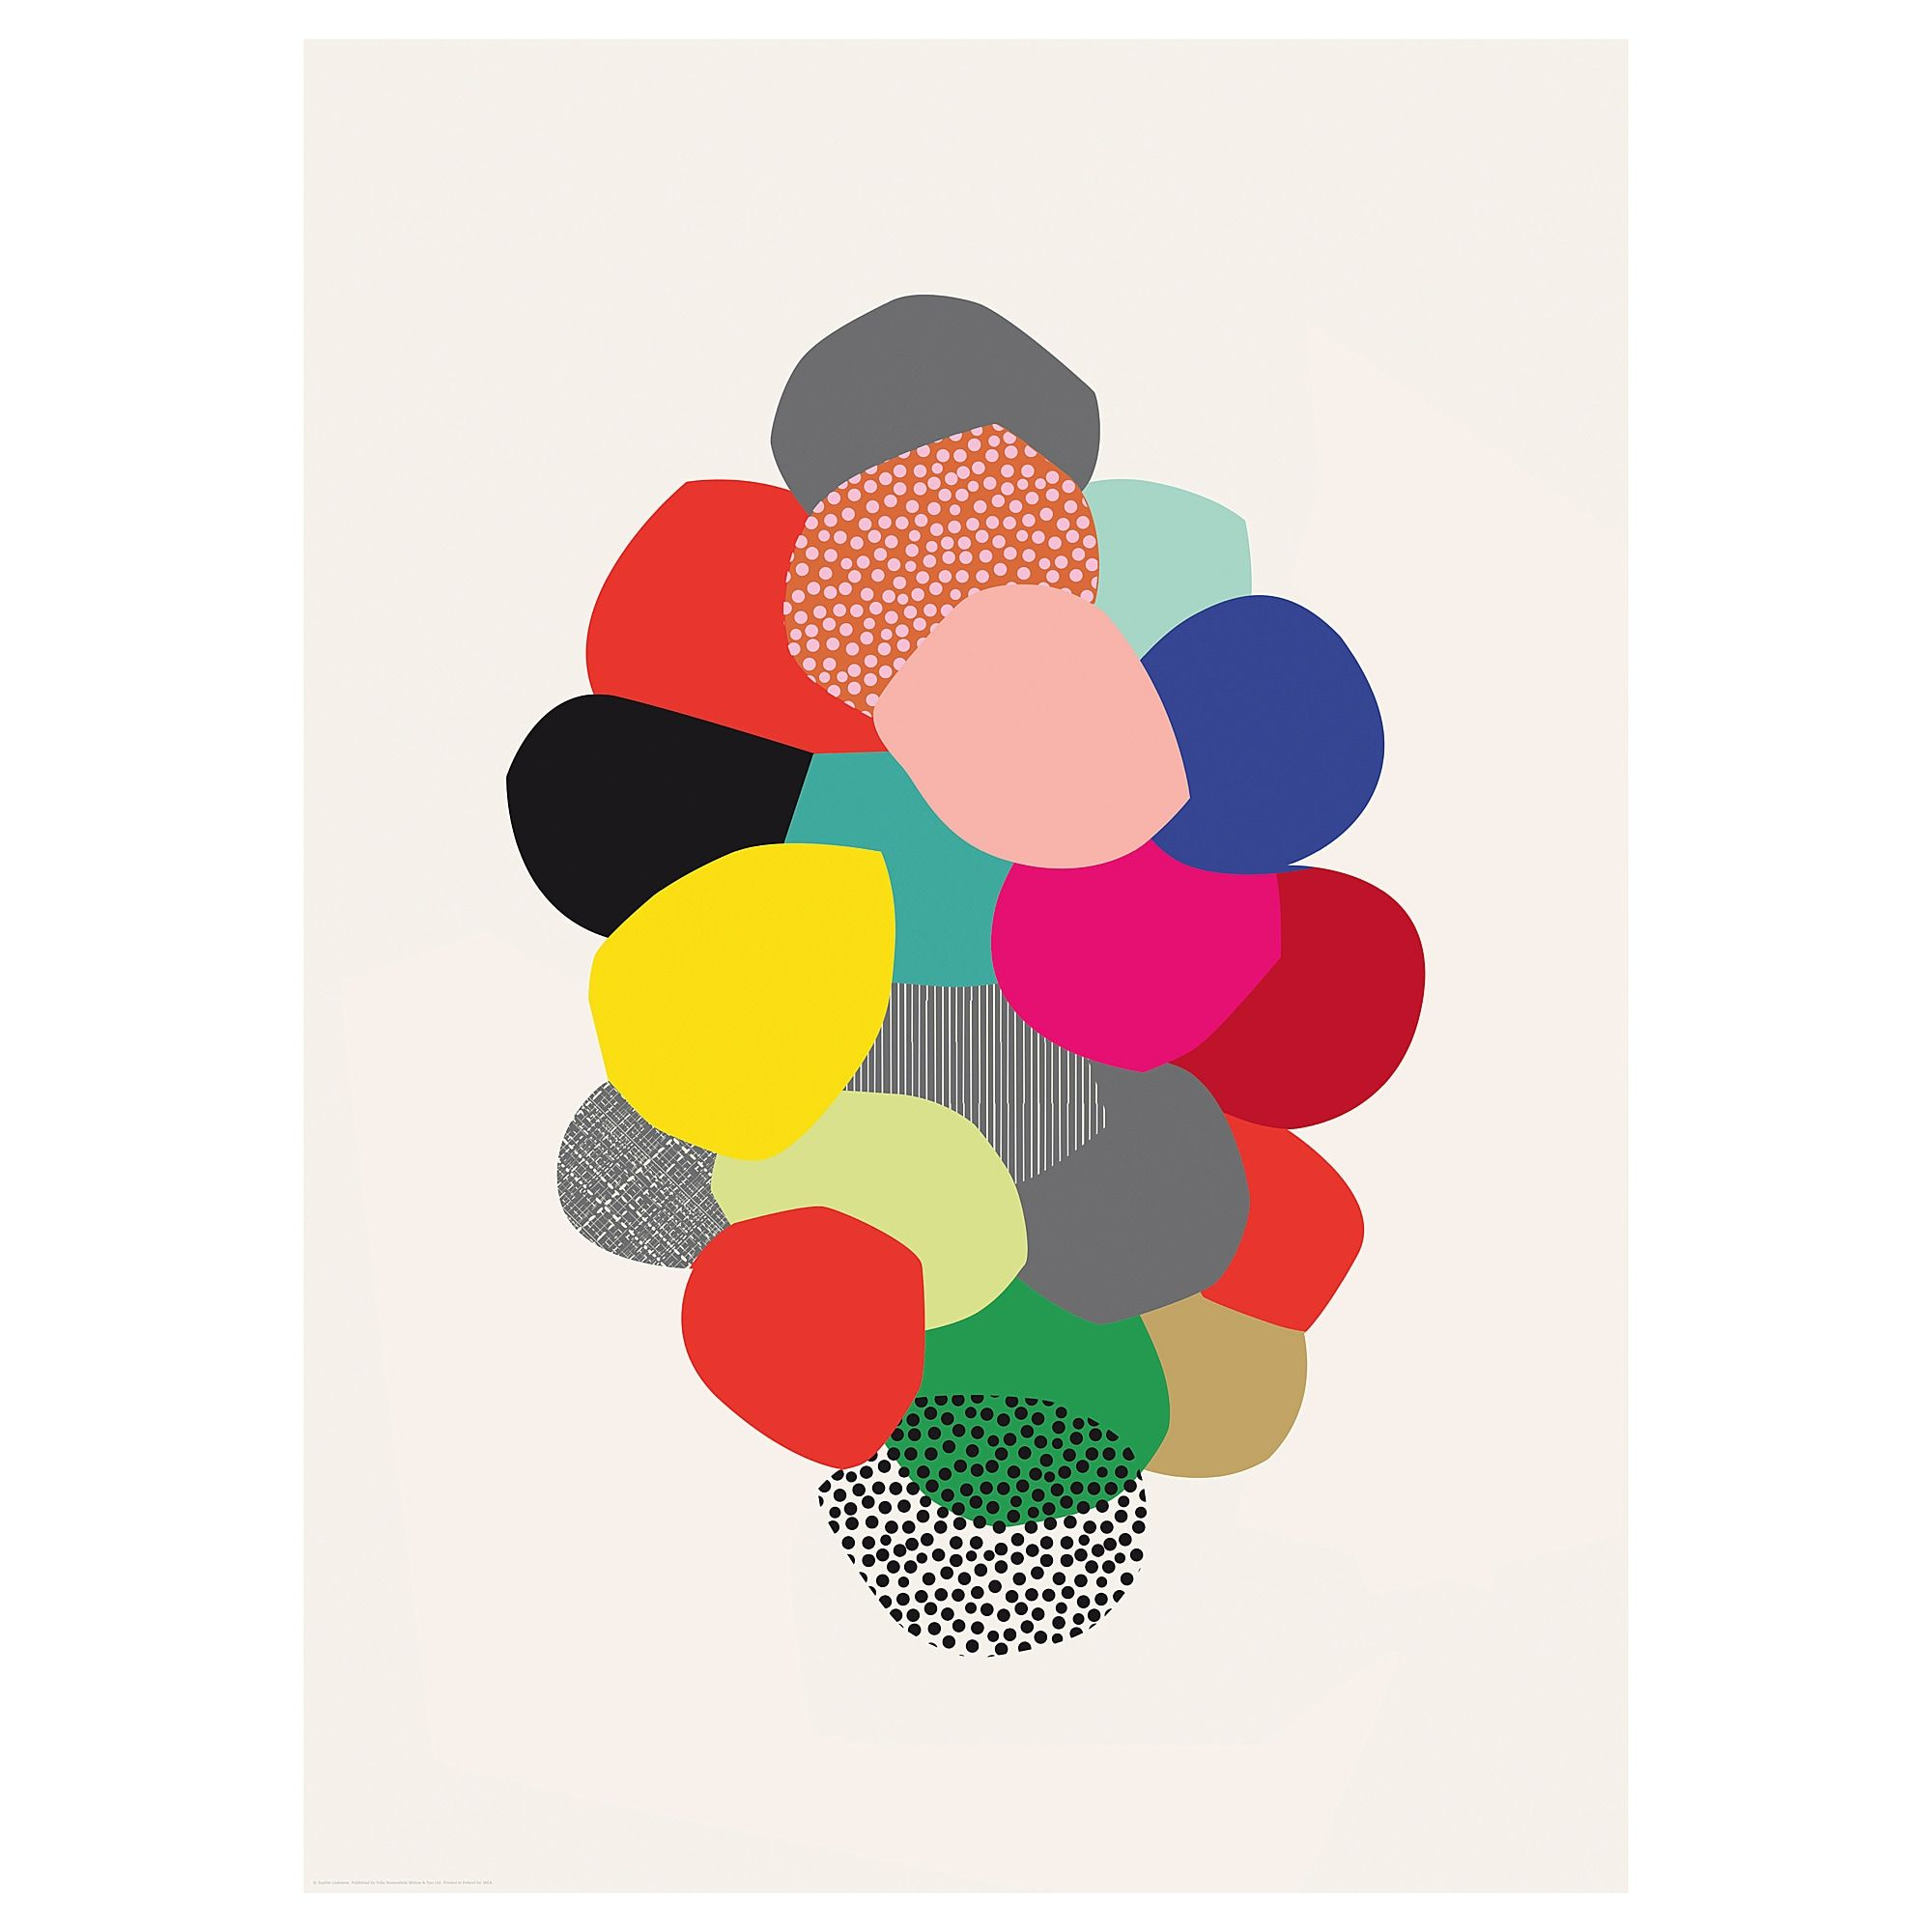 Bild Poster Cluster Ikea Bilderrahmen Ideen Bilder Poster Bilder